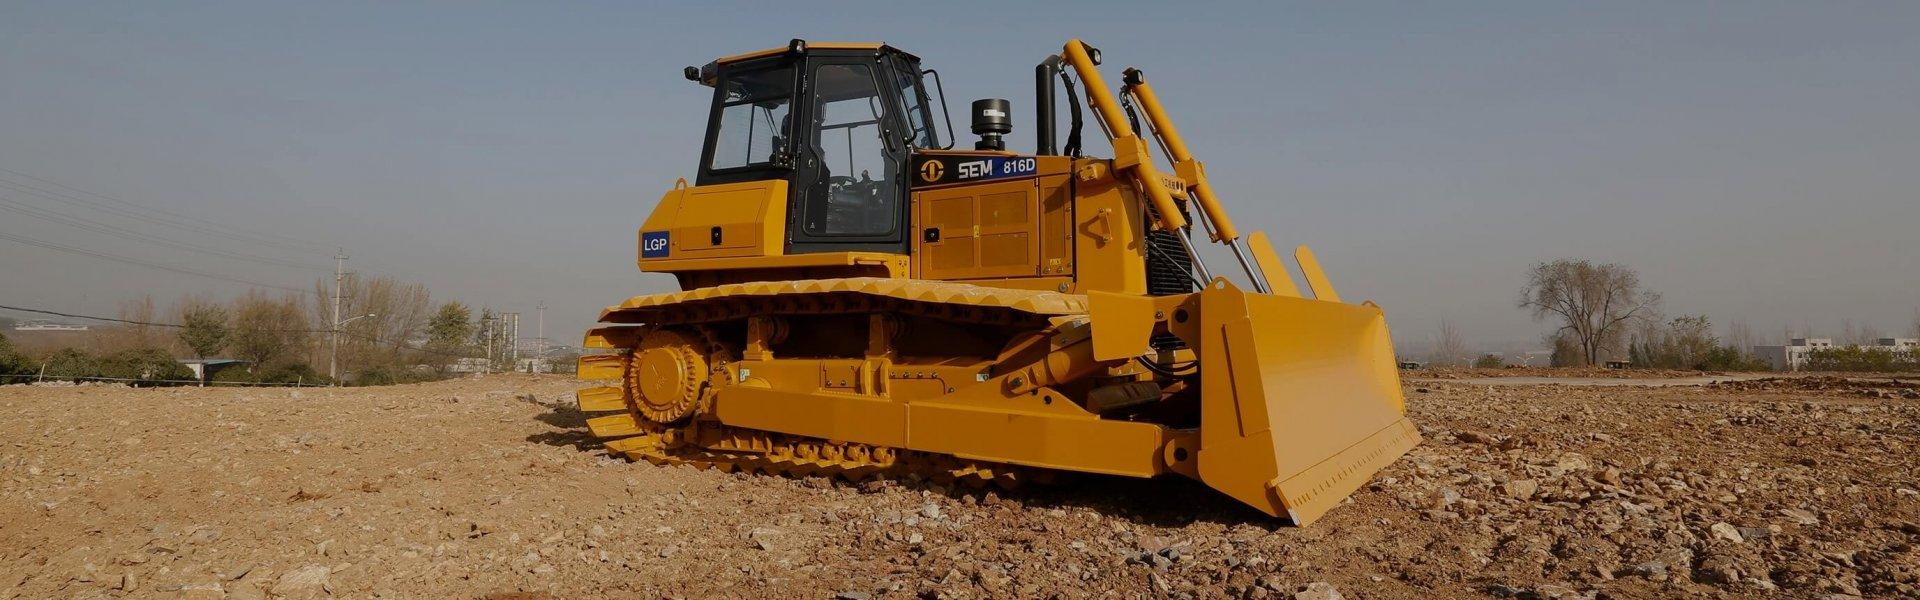 banner-bulldozer-track-type-tractor